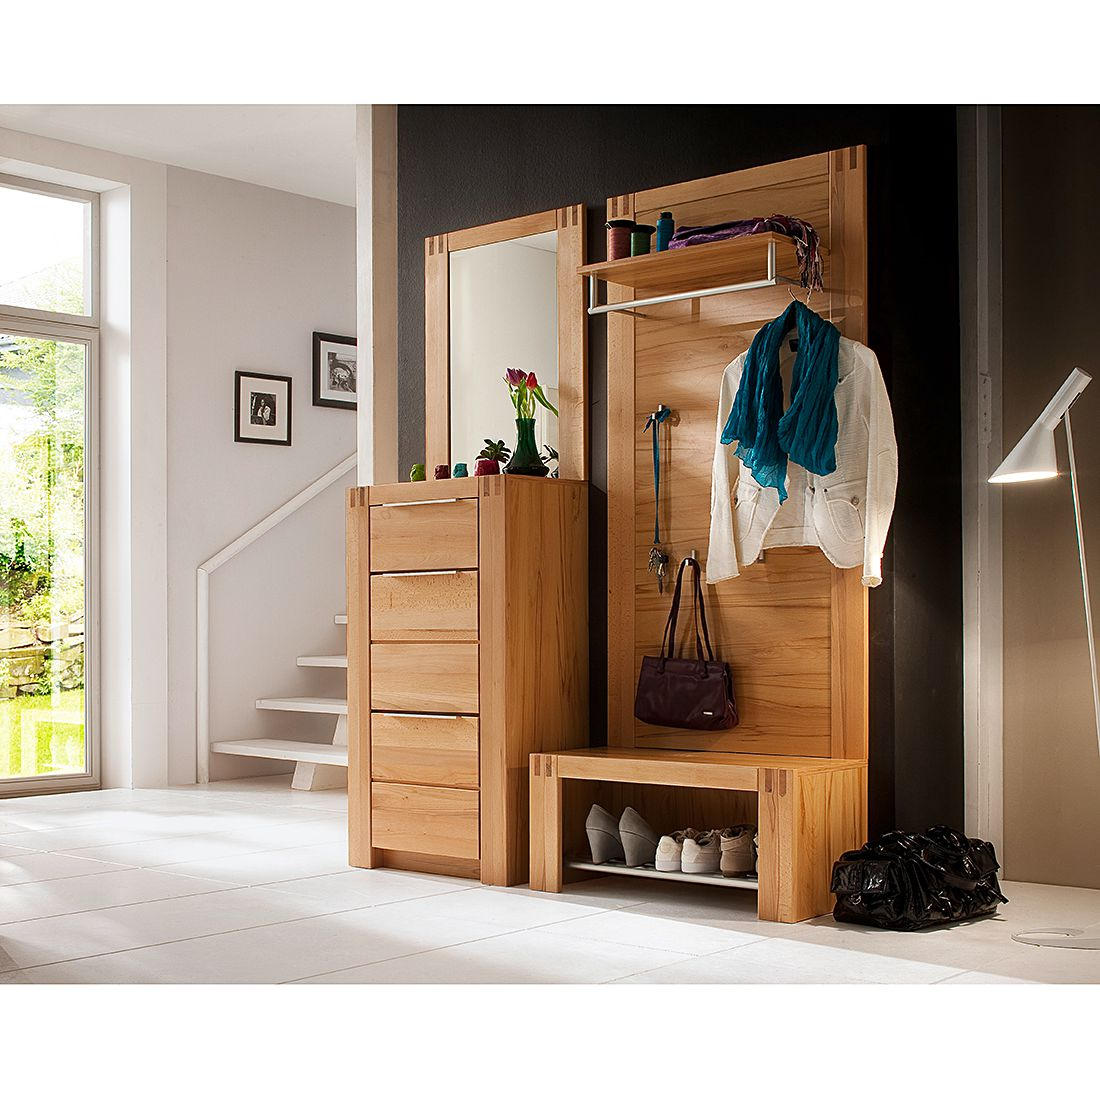 Haushalt online g nstig kaufen ber shop24 for Garderobe 4 teilig